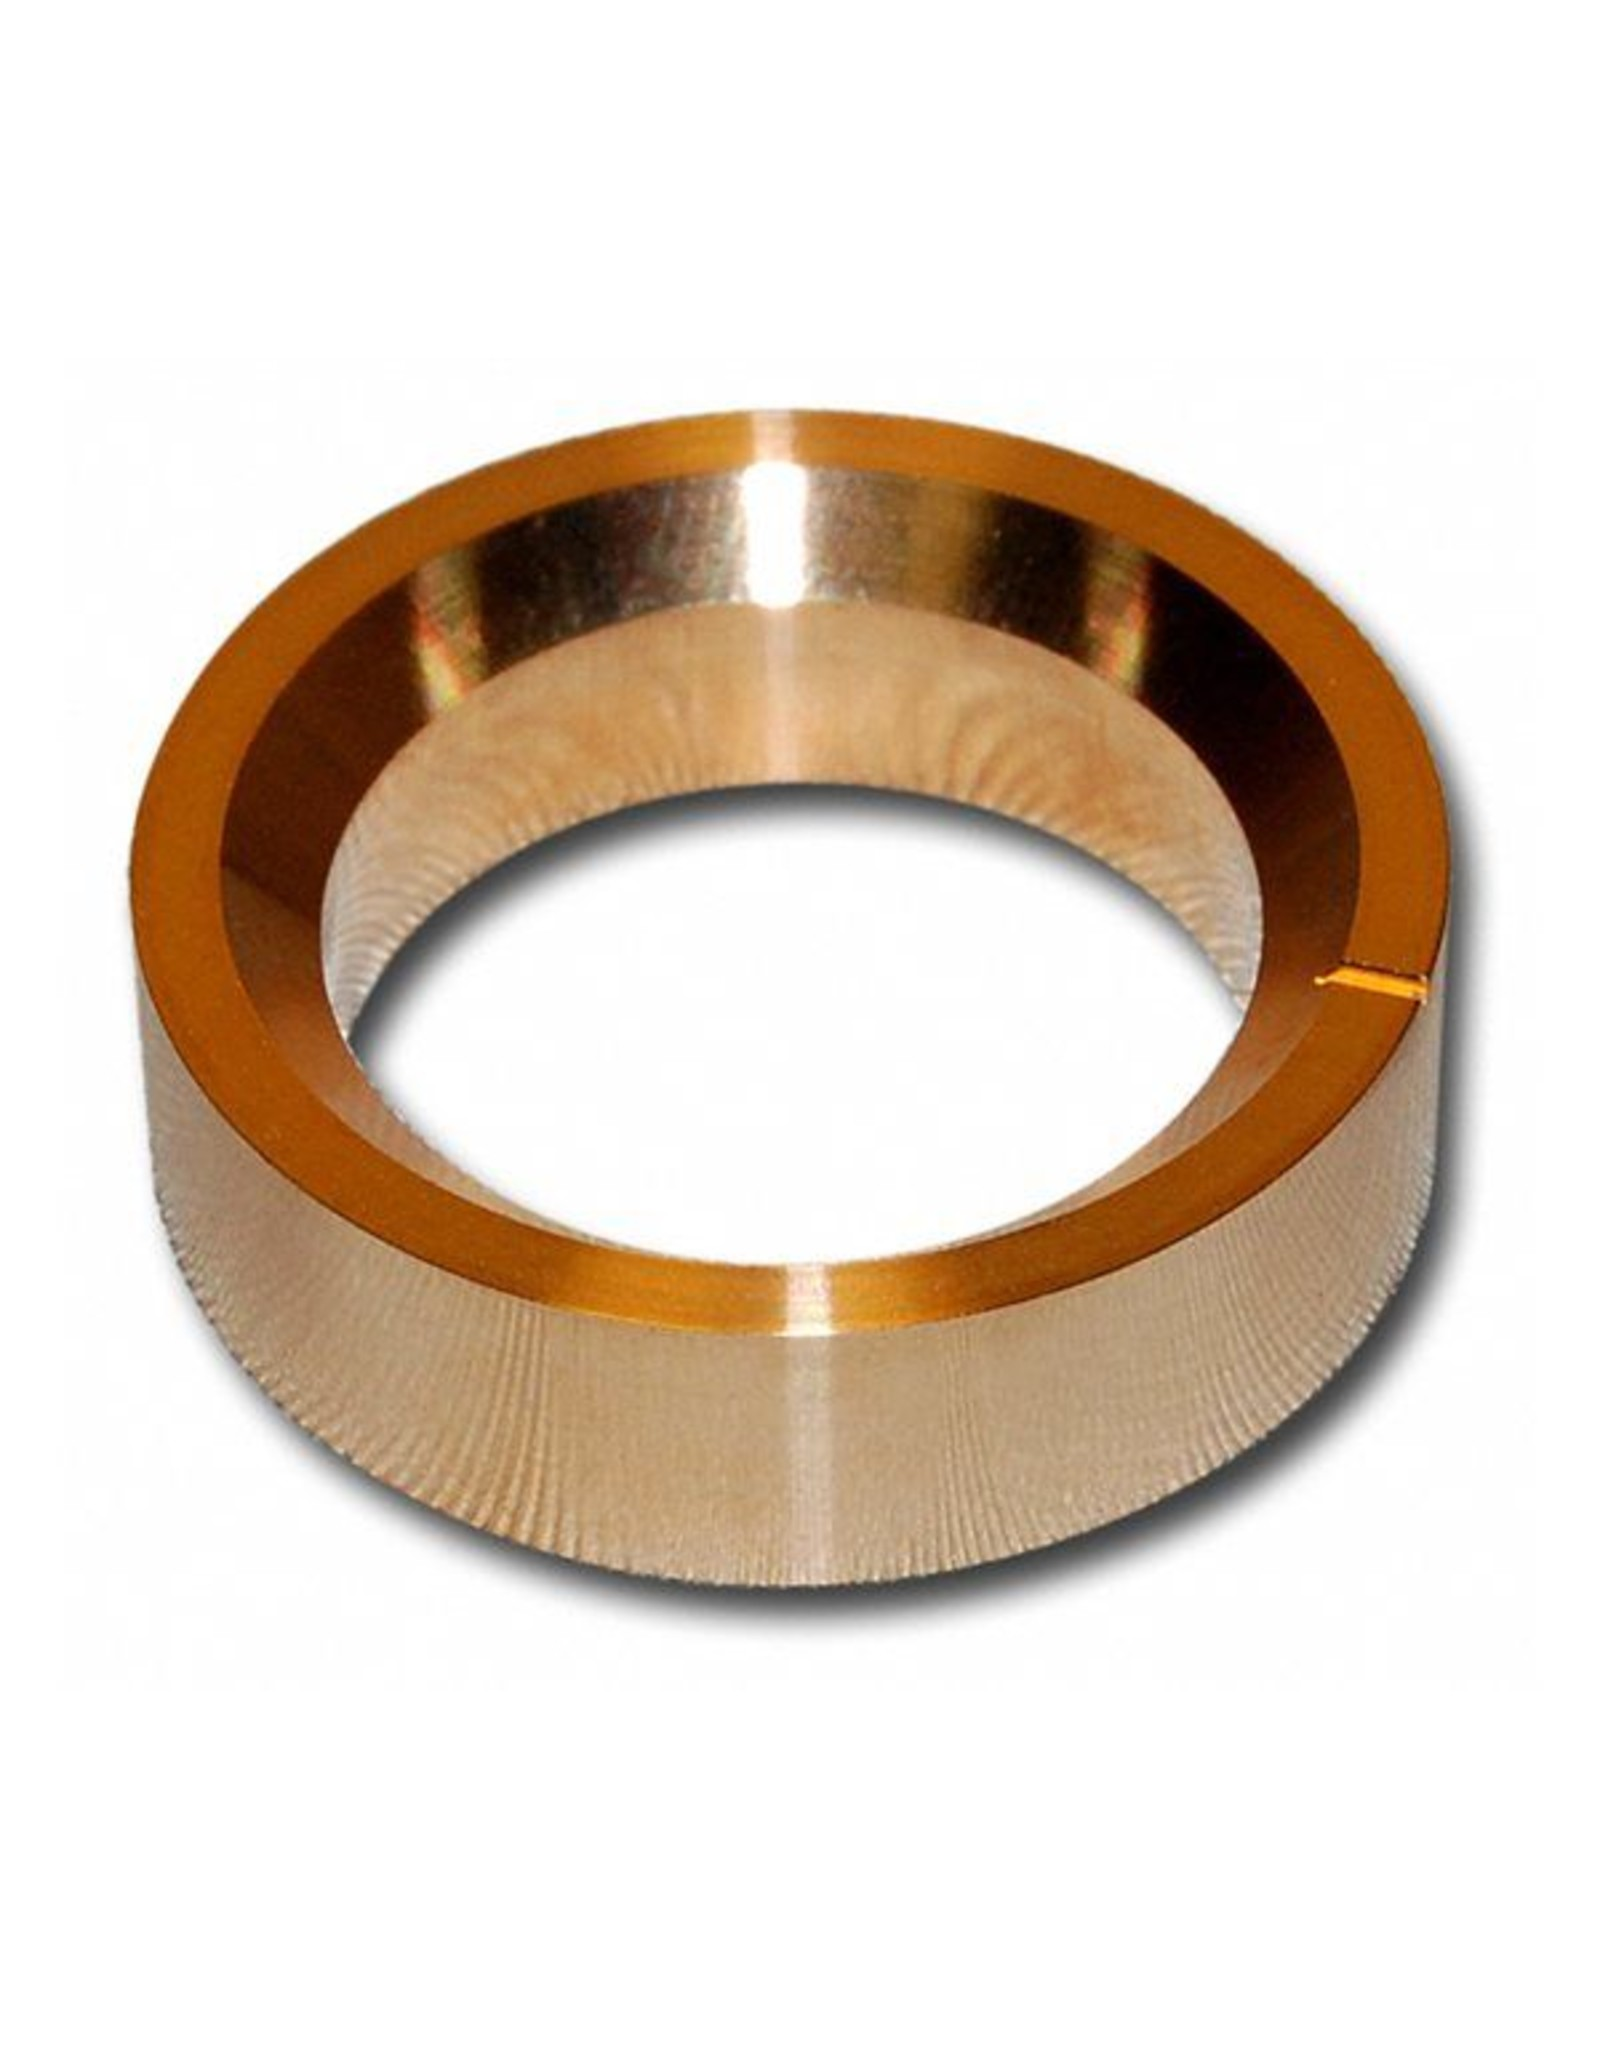 OMAX Style Static Backup Ring